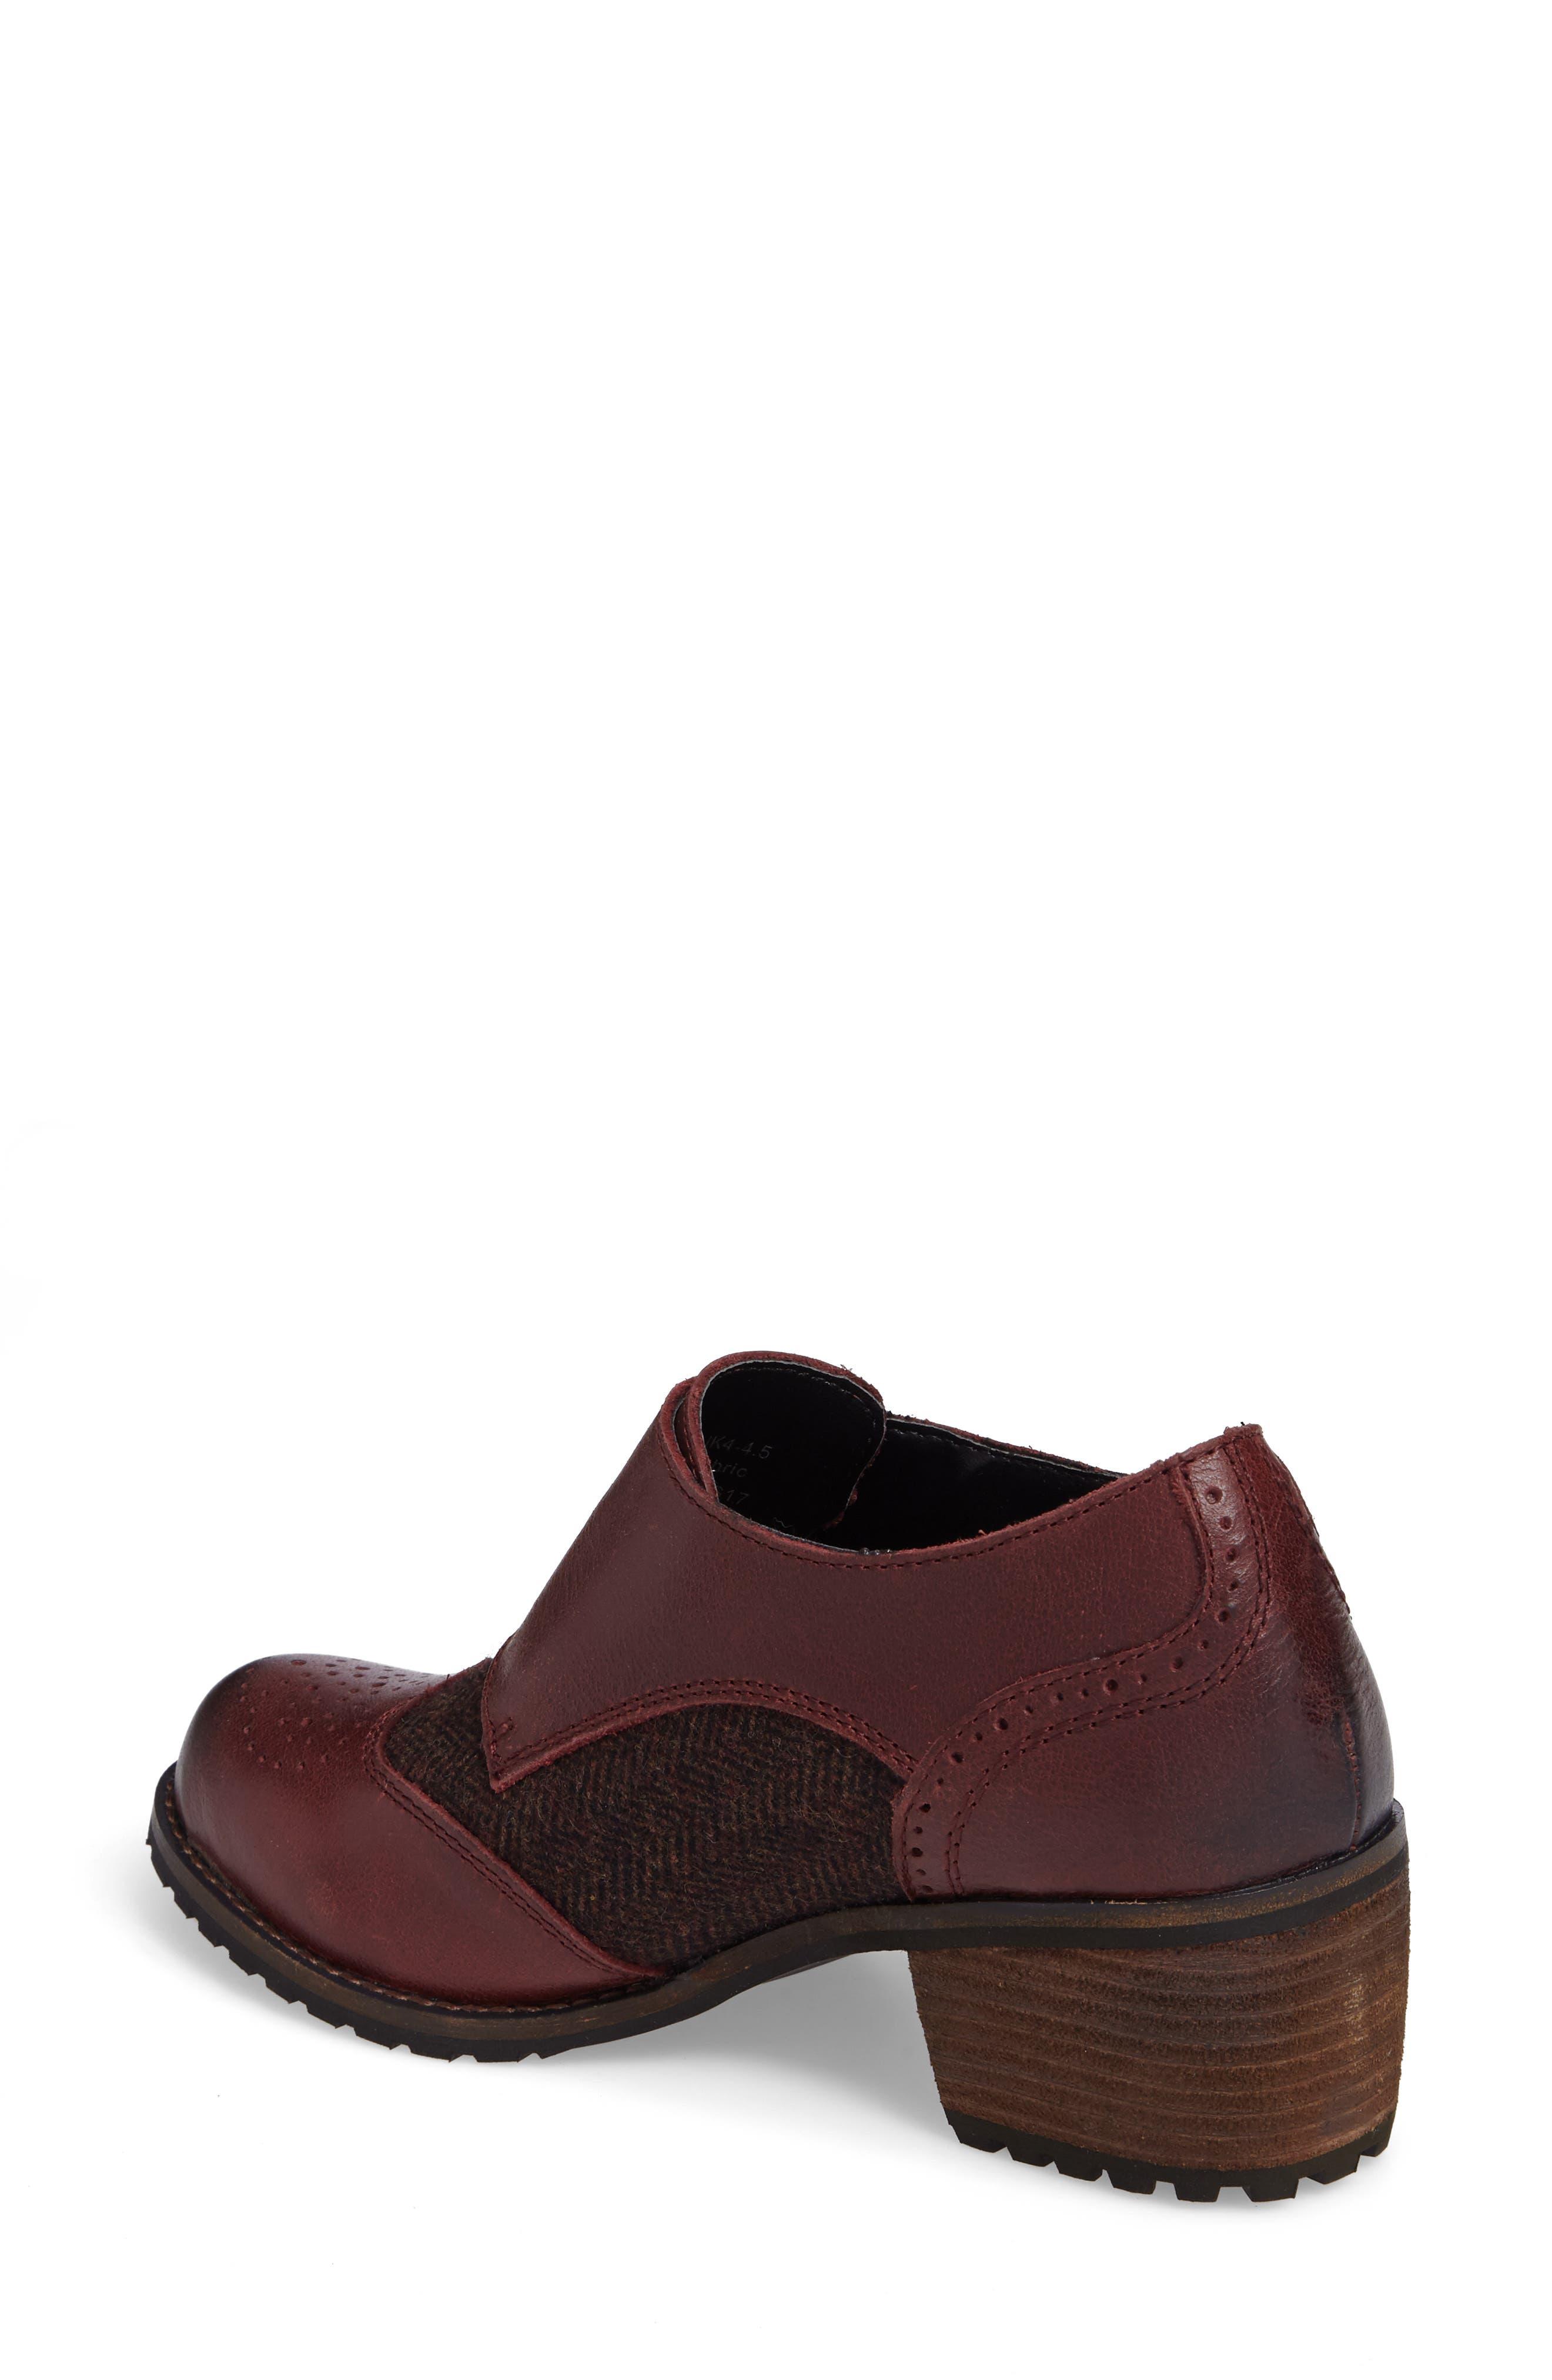 Dina Double Monk Strap Ankle Boot,                             Alternate thumbnail 2, color,                             Merlot Leather